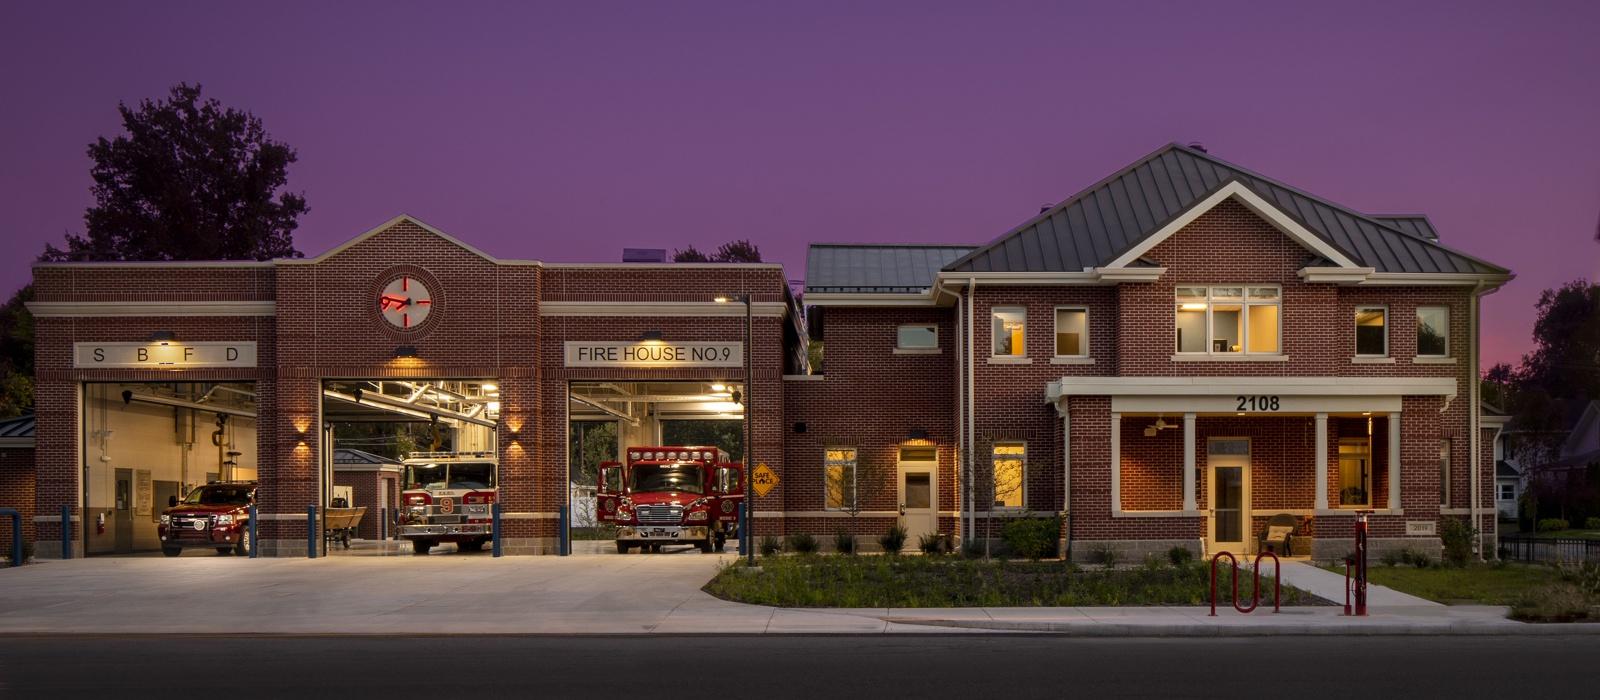 SBFD Fire Station No 9.jpg